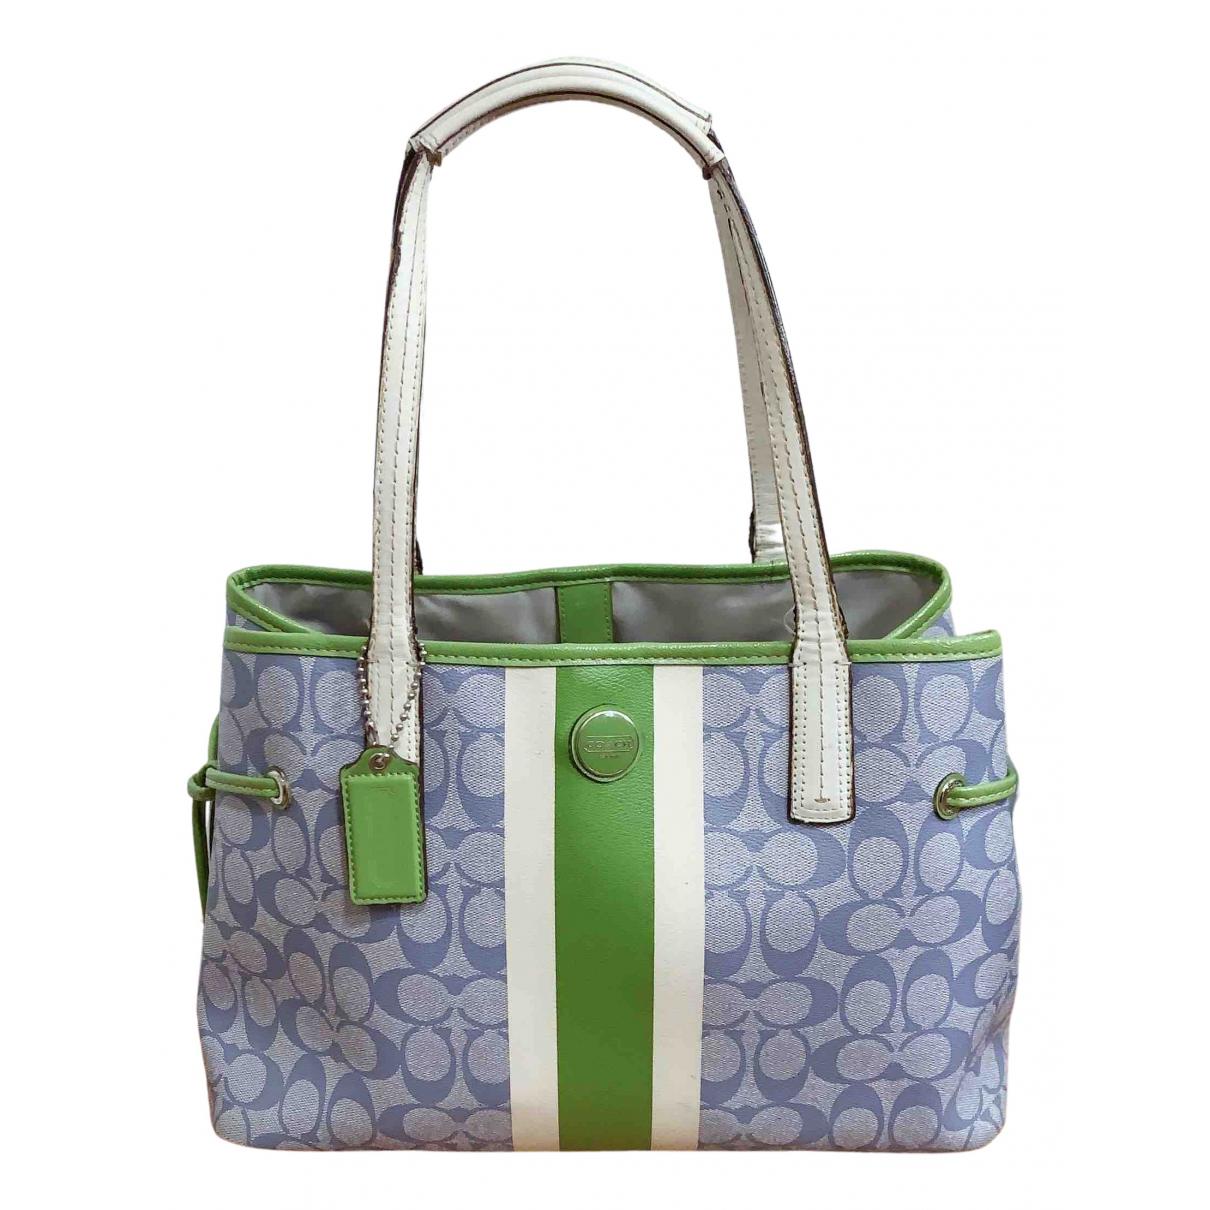 Coach Edie Green Leather Handbags